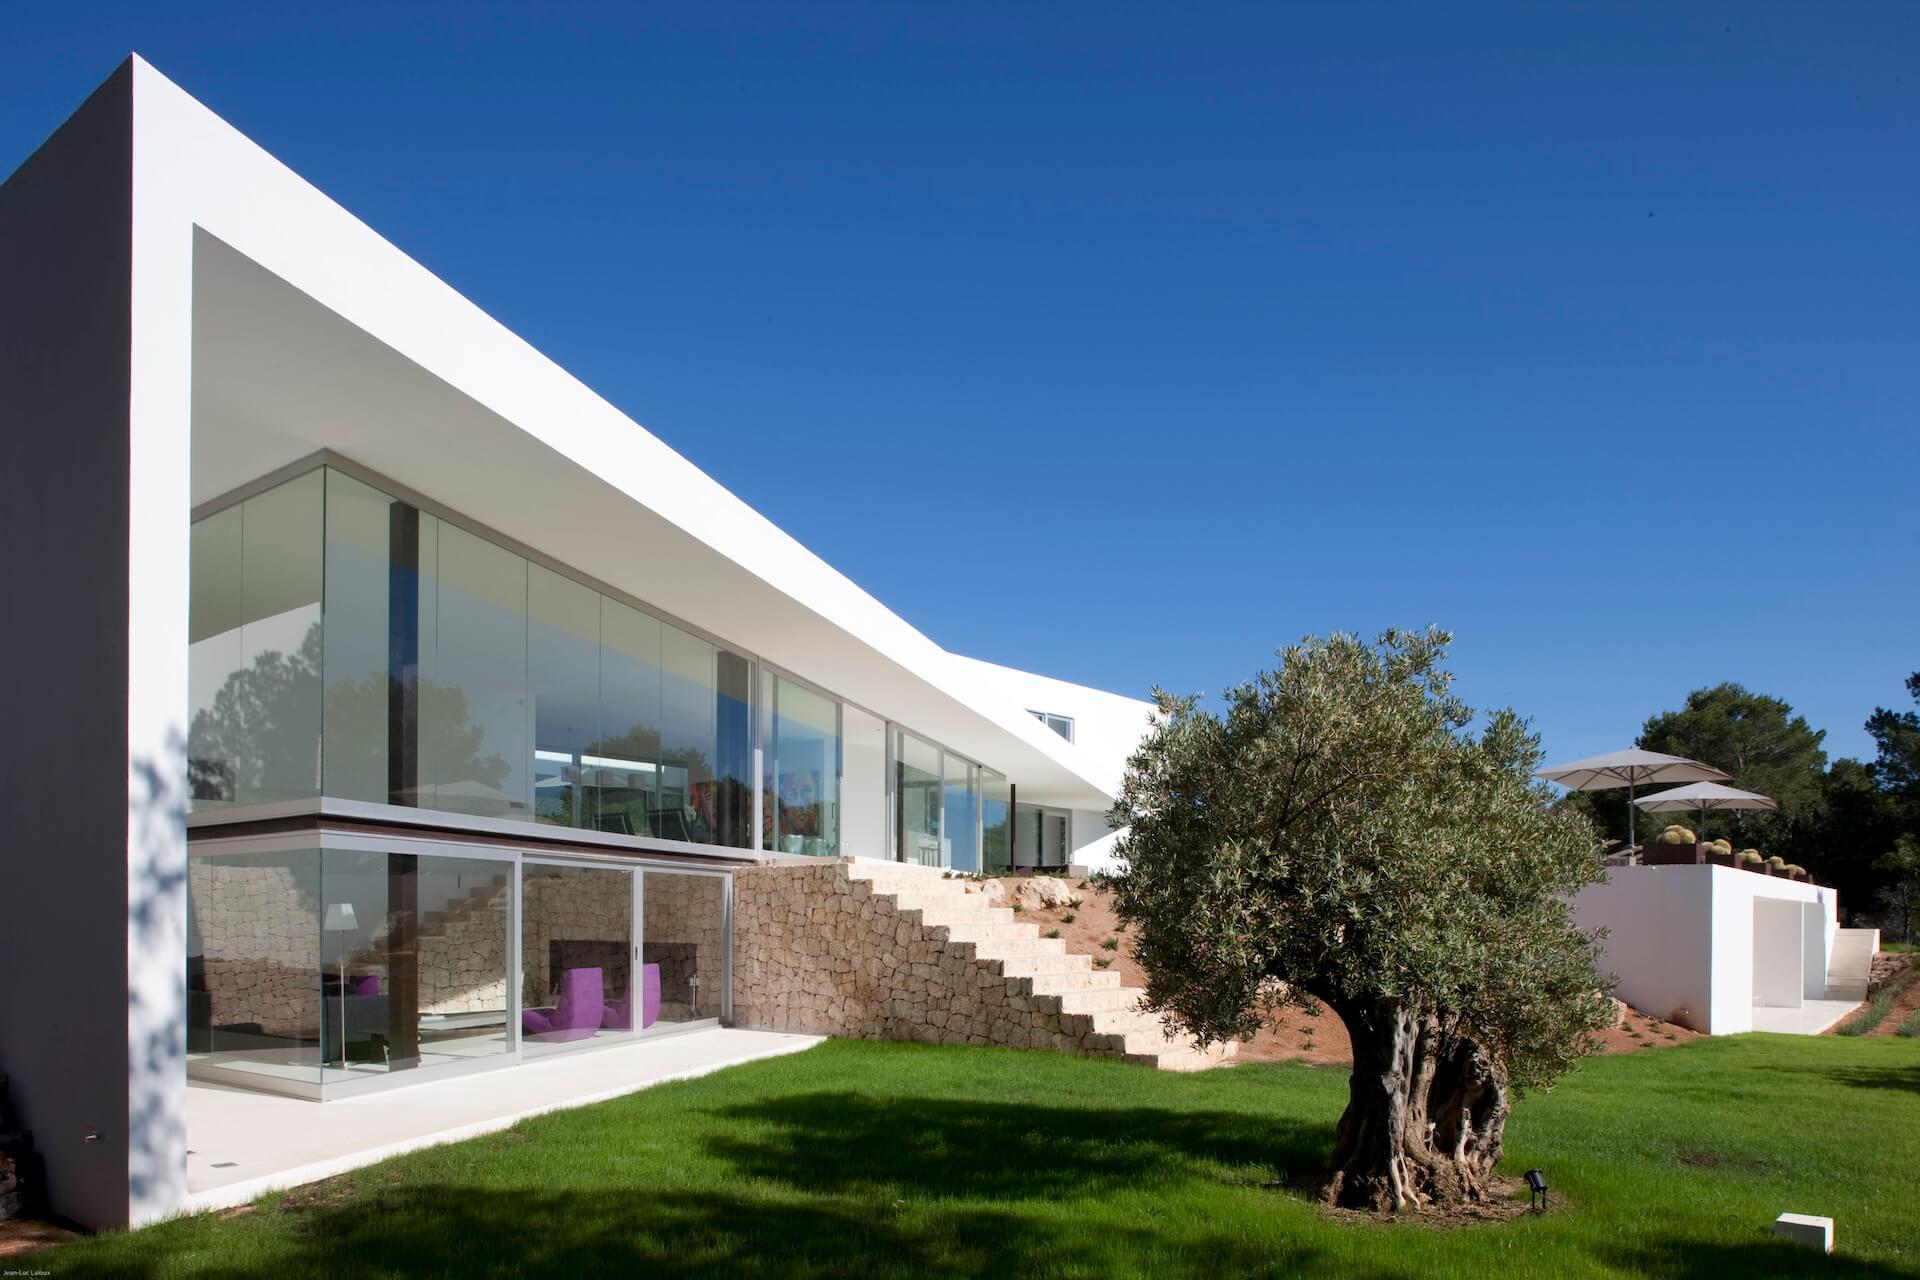 Ferien villa zwischen punta galera und cala salada ibiza for Villa a ibiza